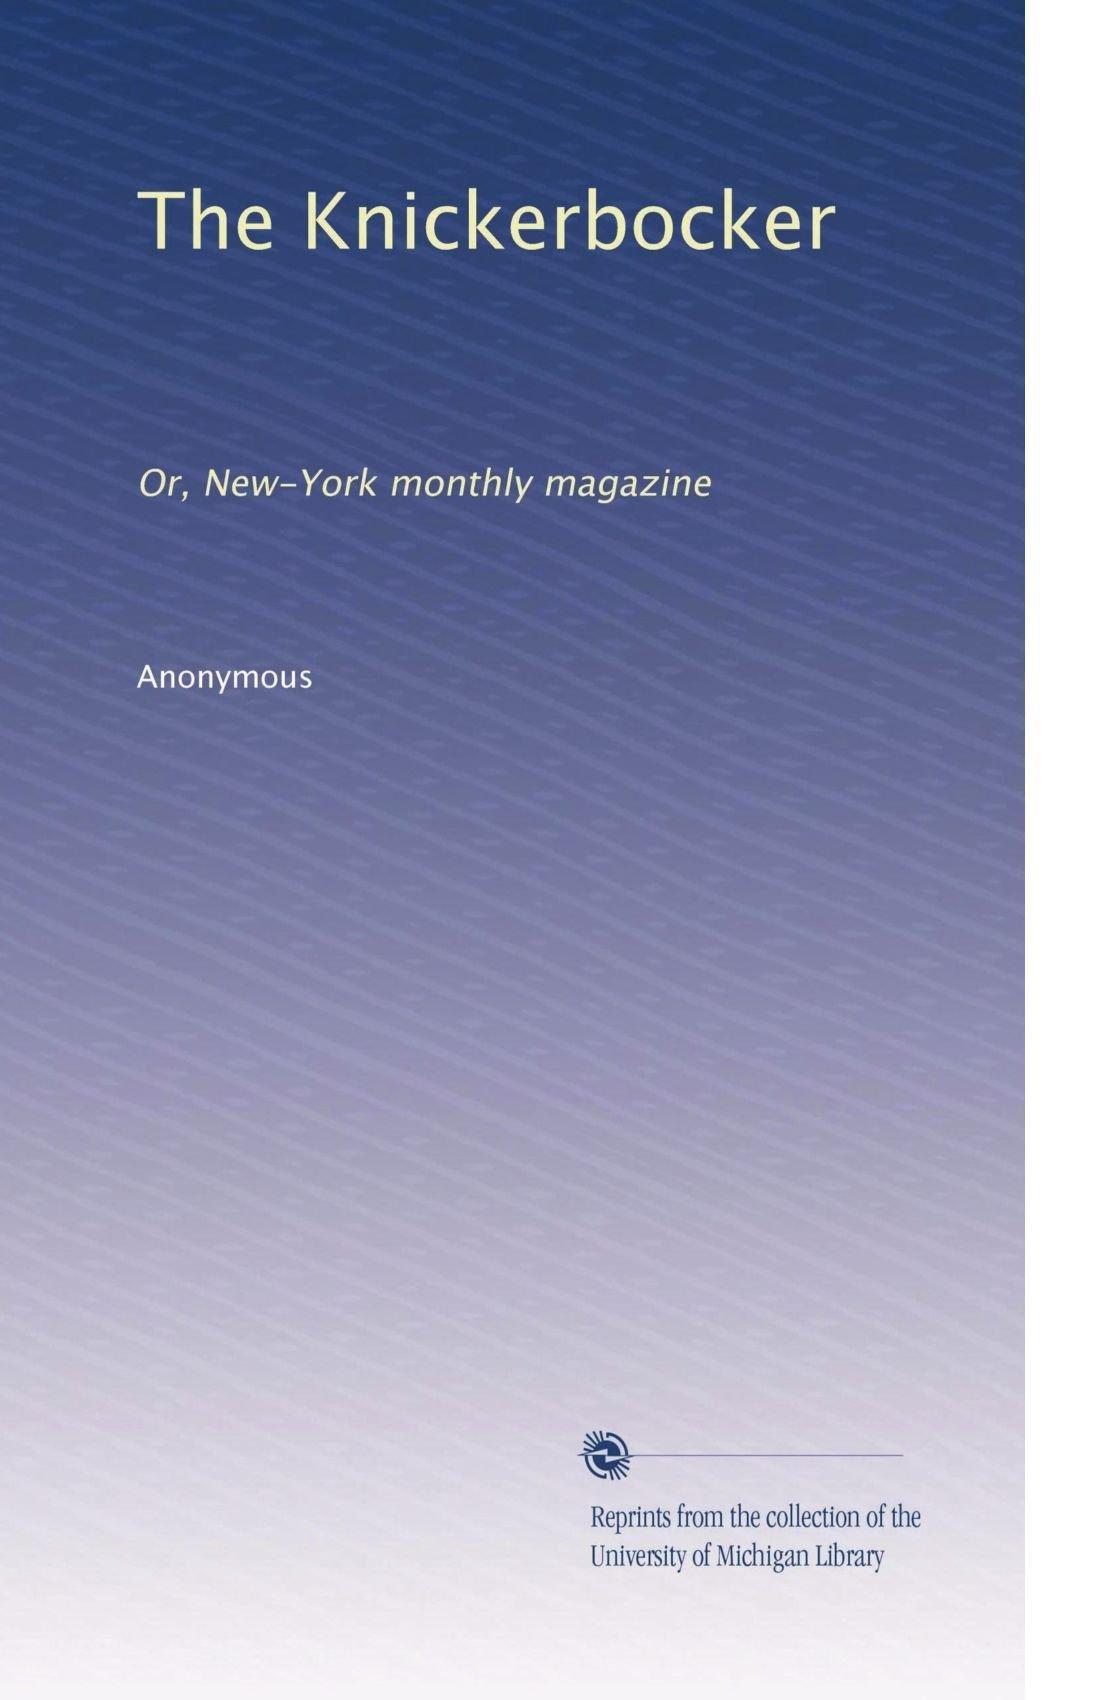 The Knickerbocker: Or, New-York monthly magazine (Volume 37) pdf